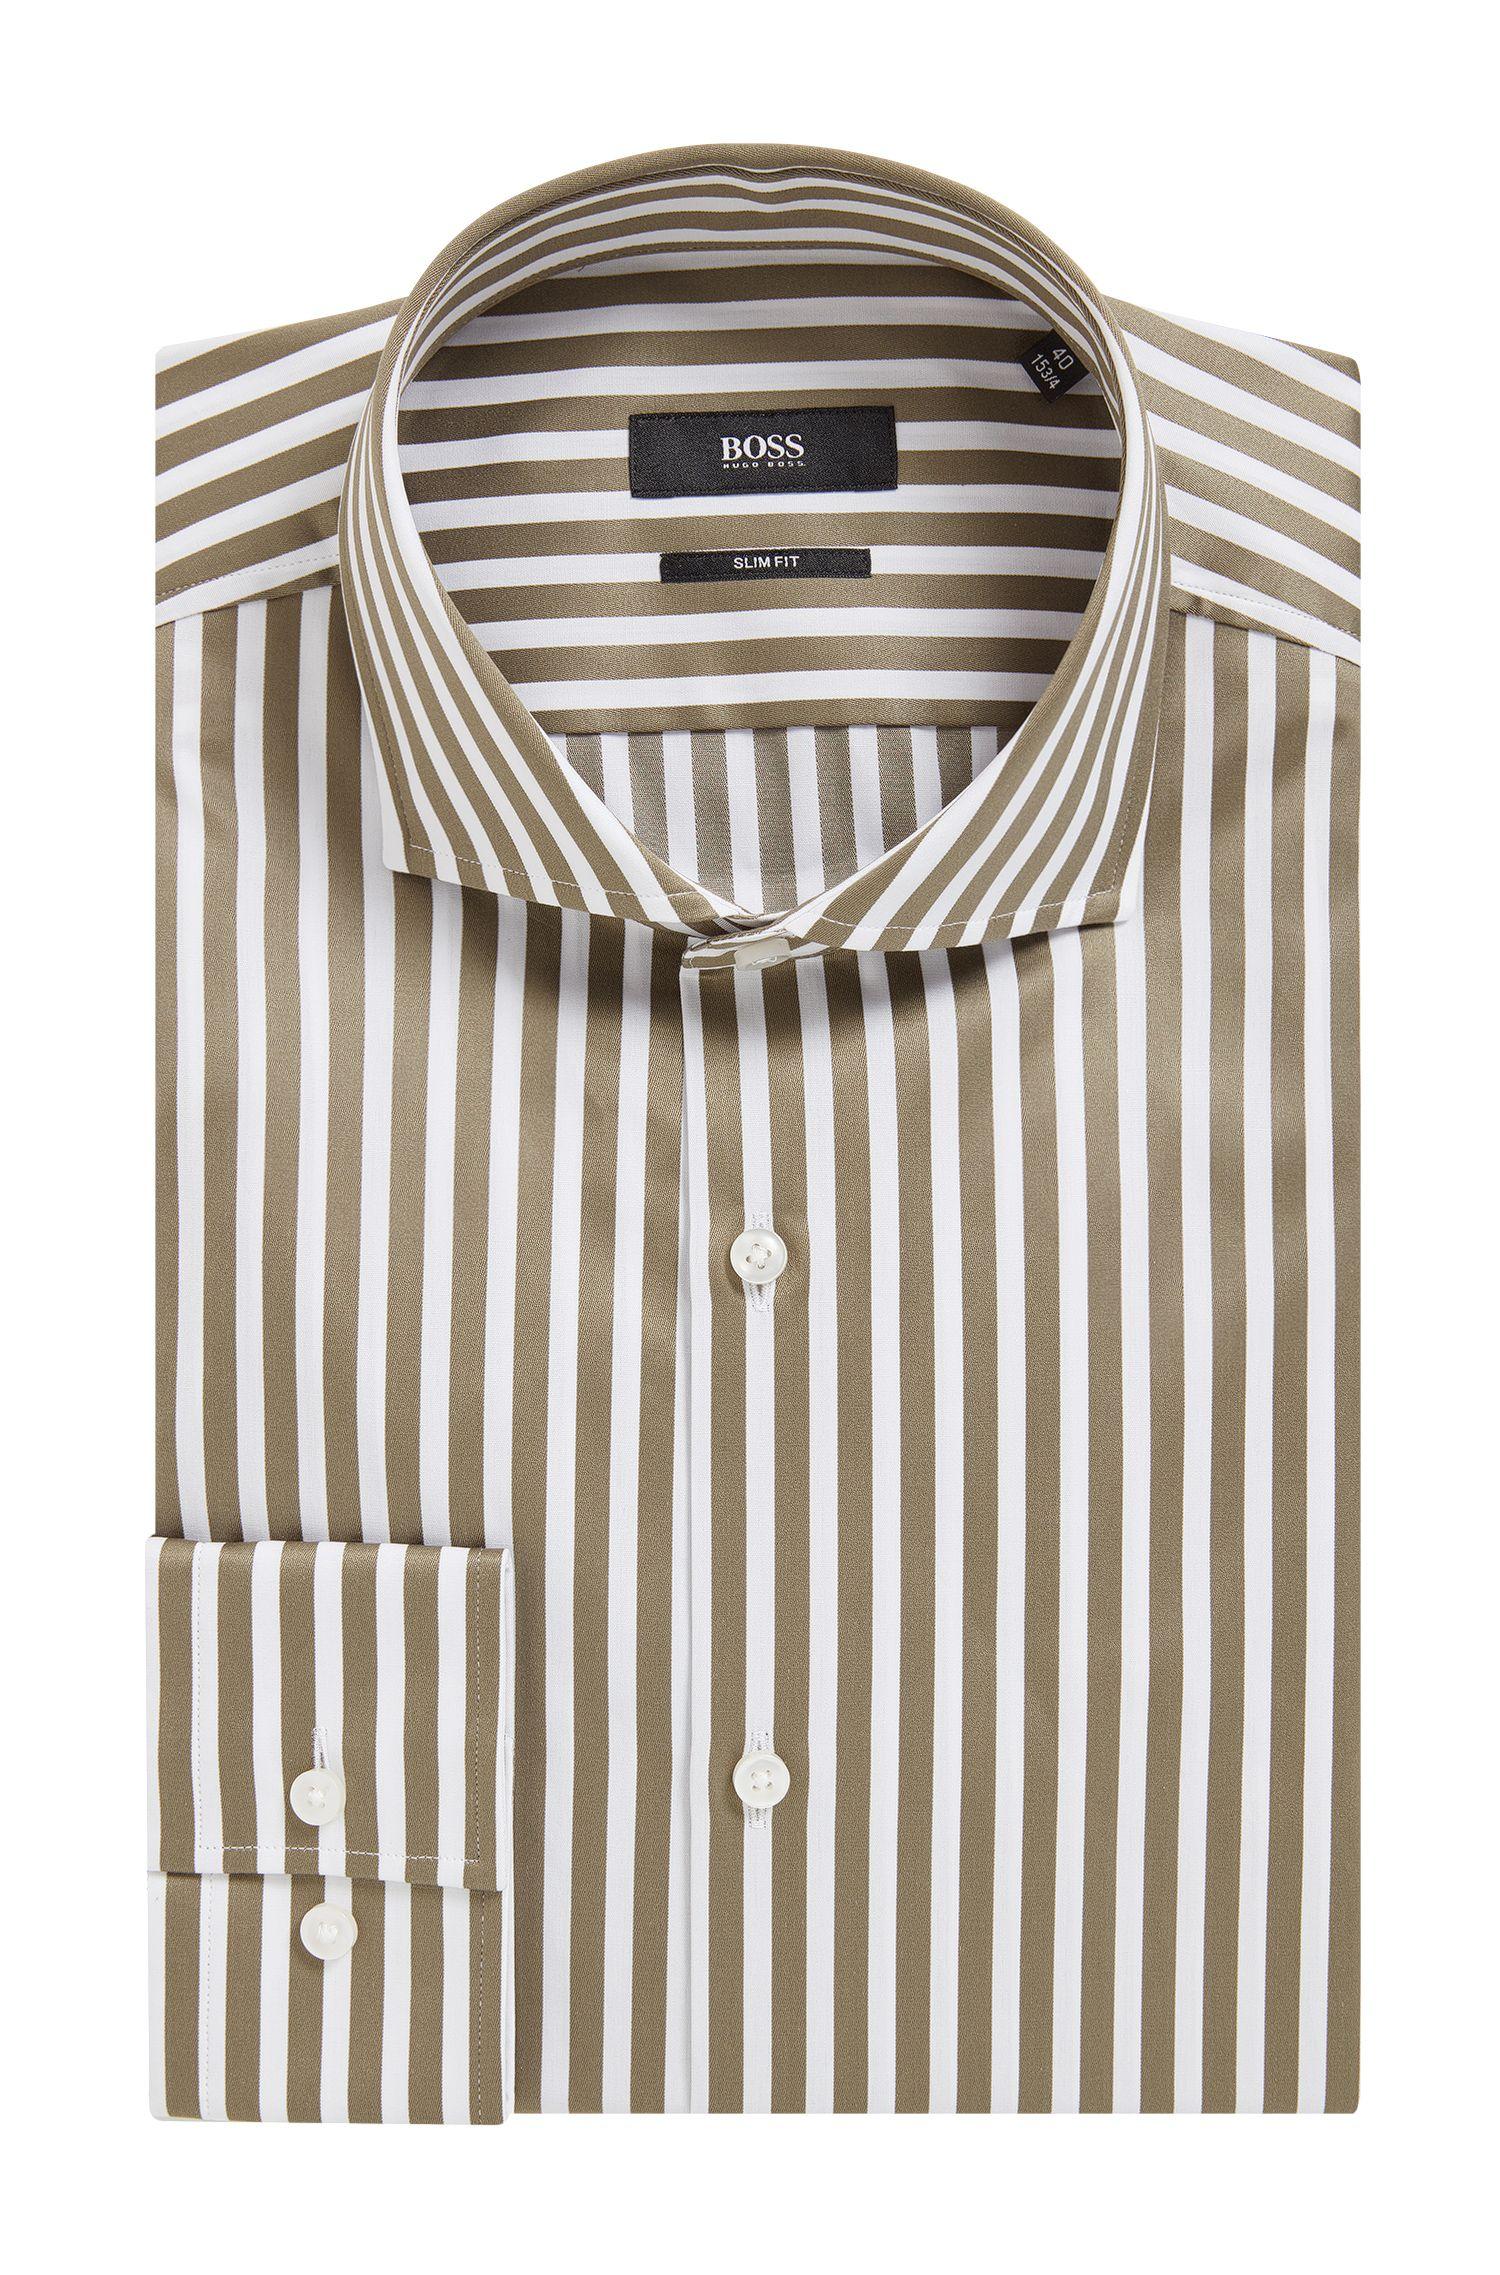 Striped Cotton Dress Shirt, Slim Fit | Jason